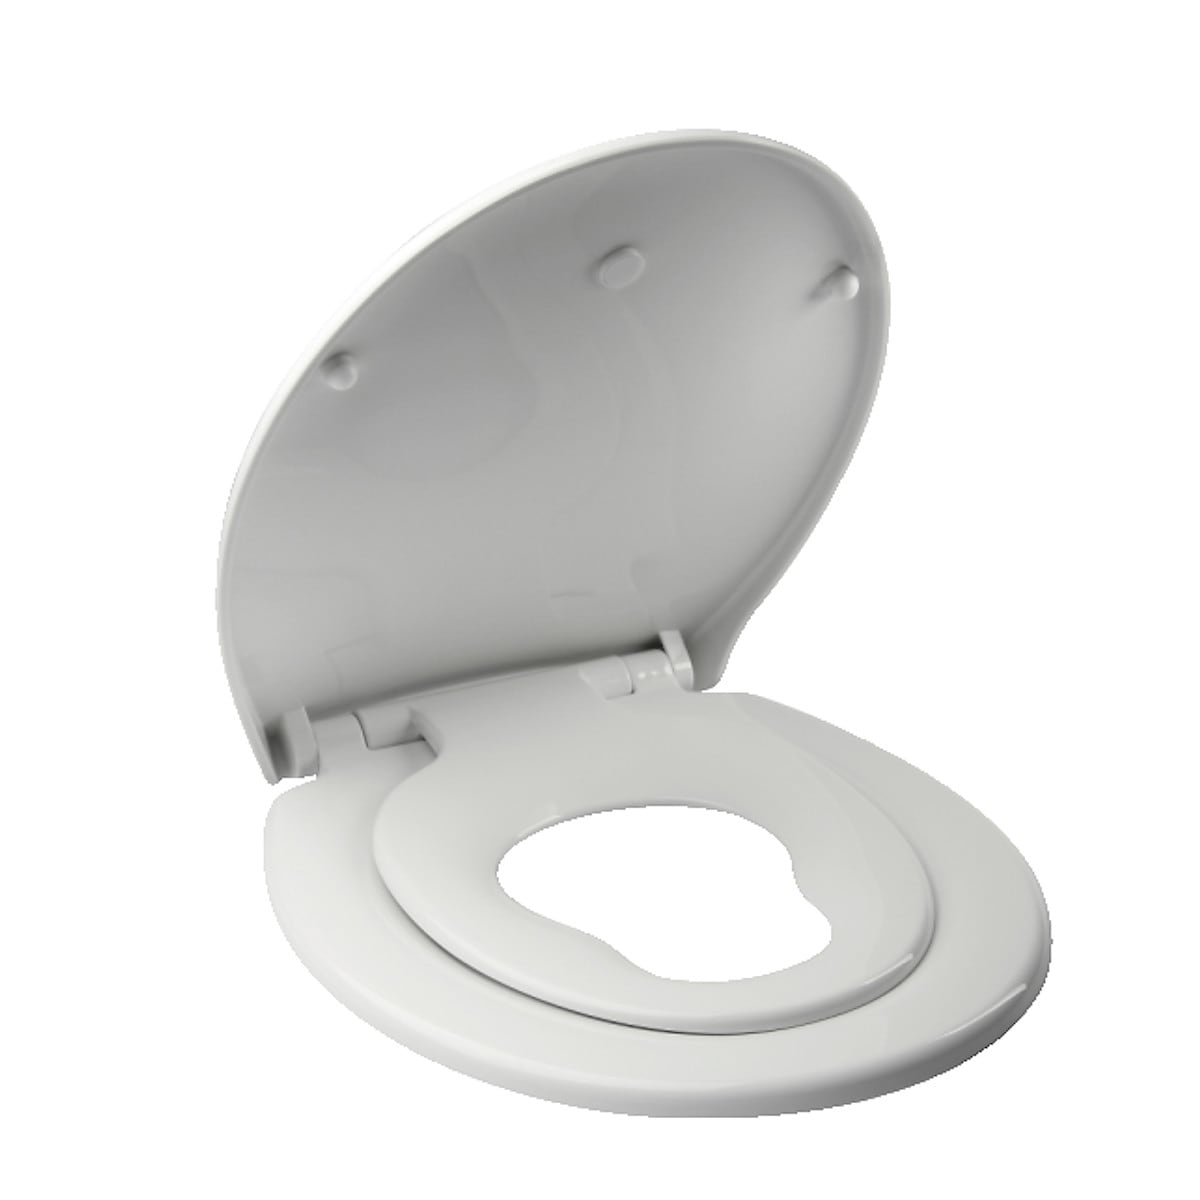 Toalettsits familj, soft close